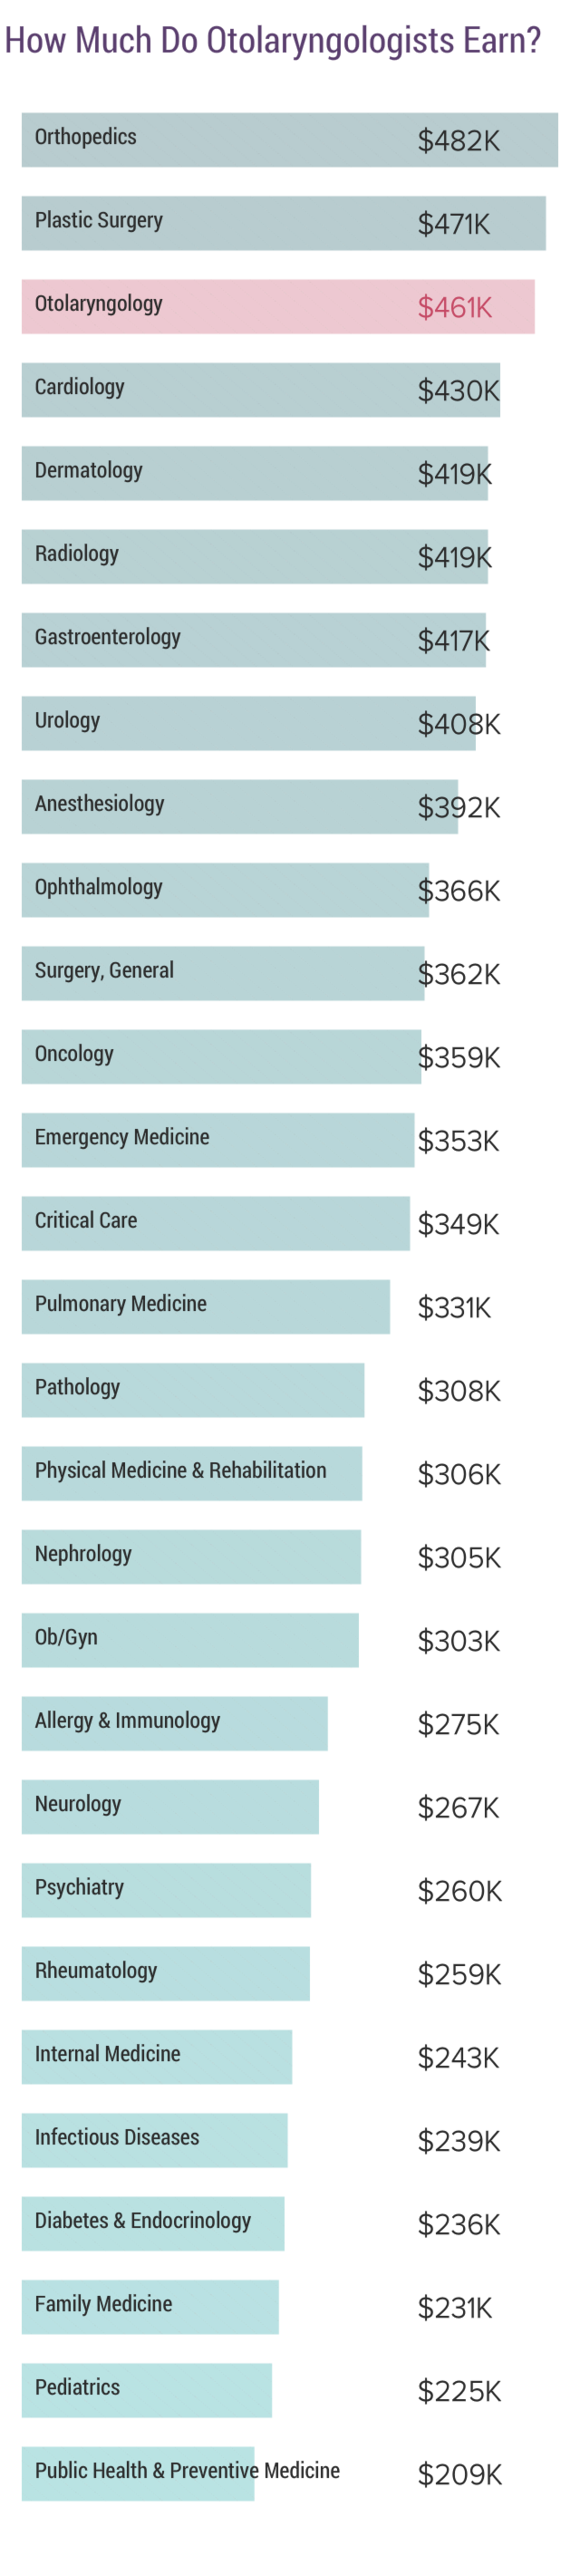 Medscape Otolaryngologist Compensation Report 2019